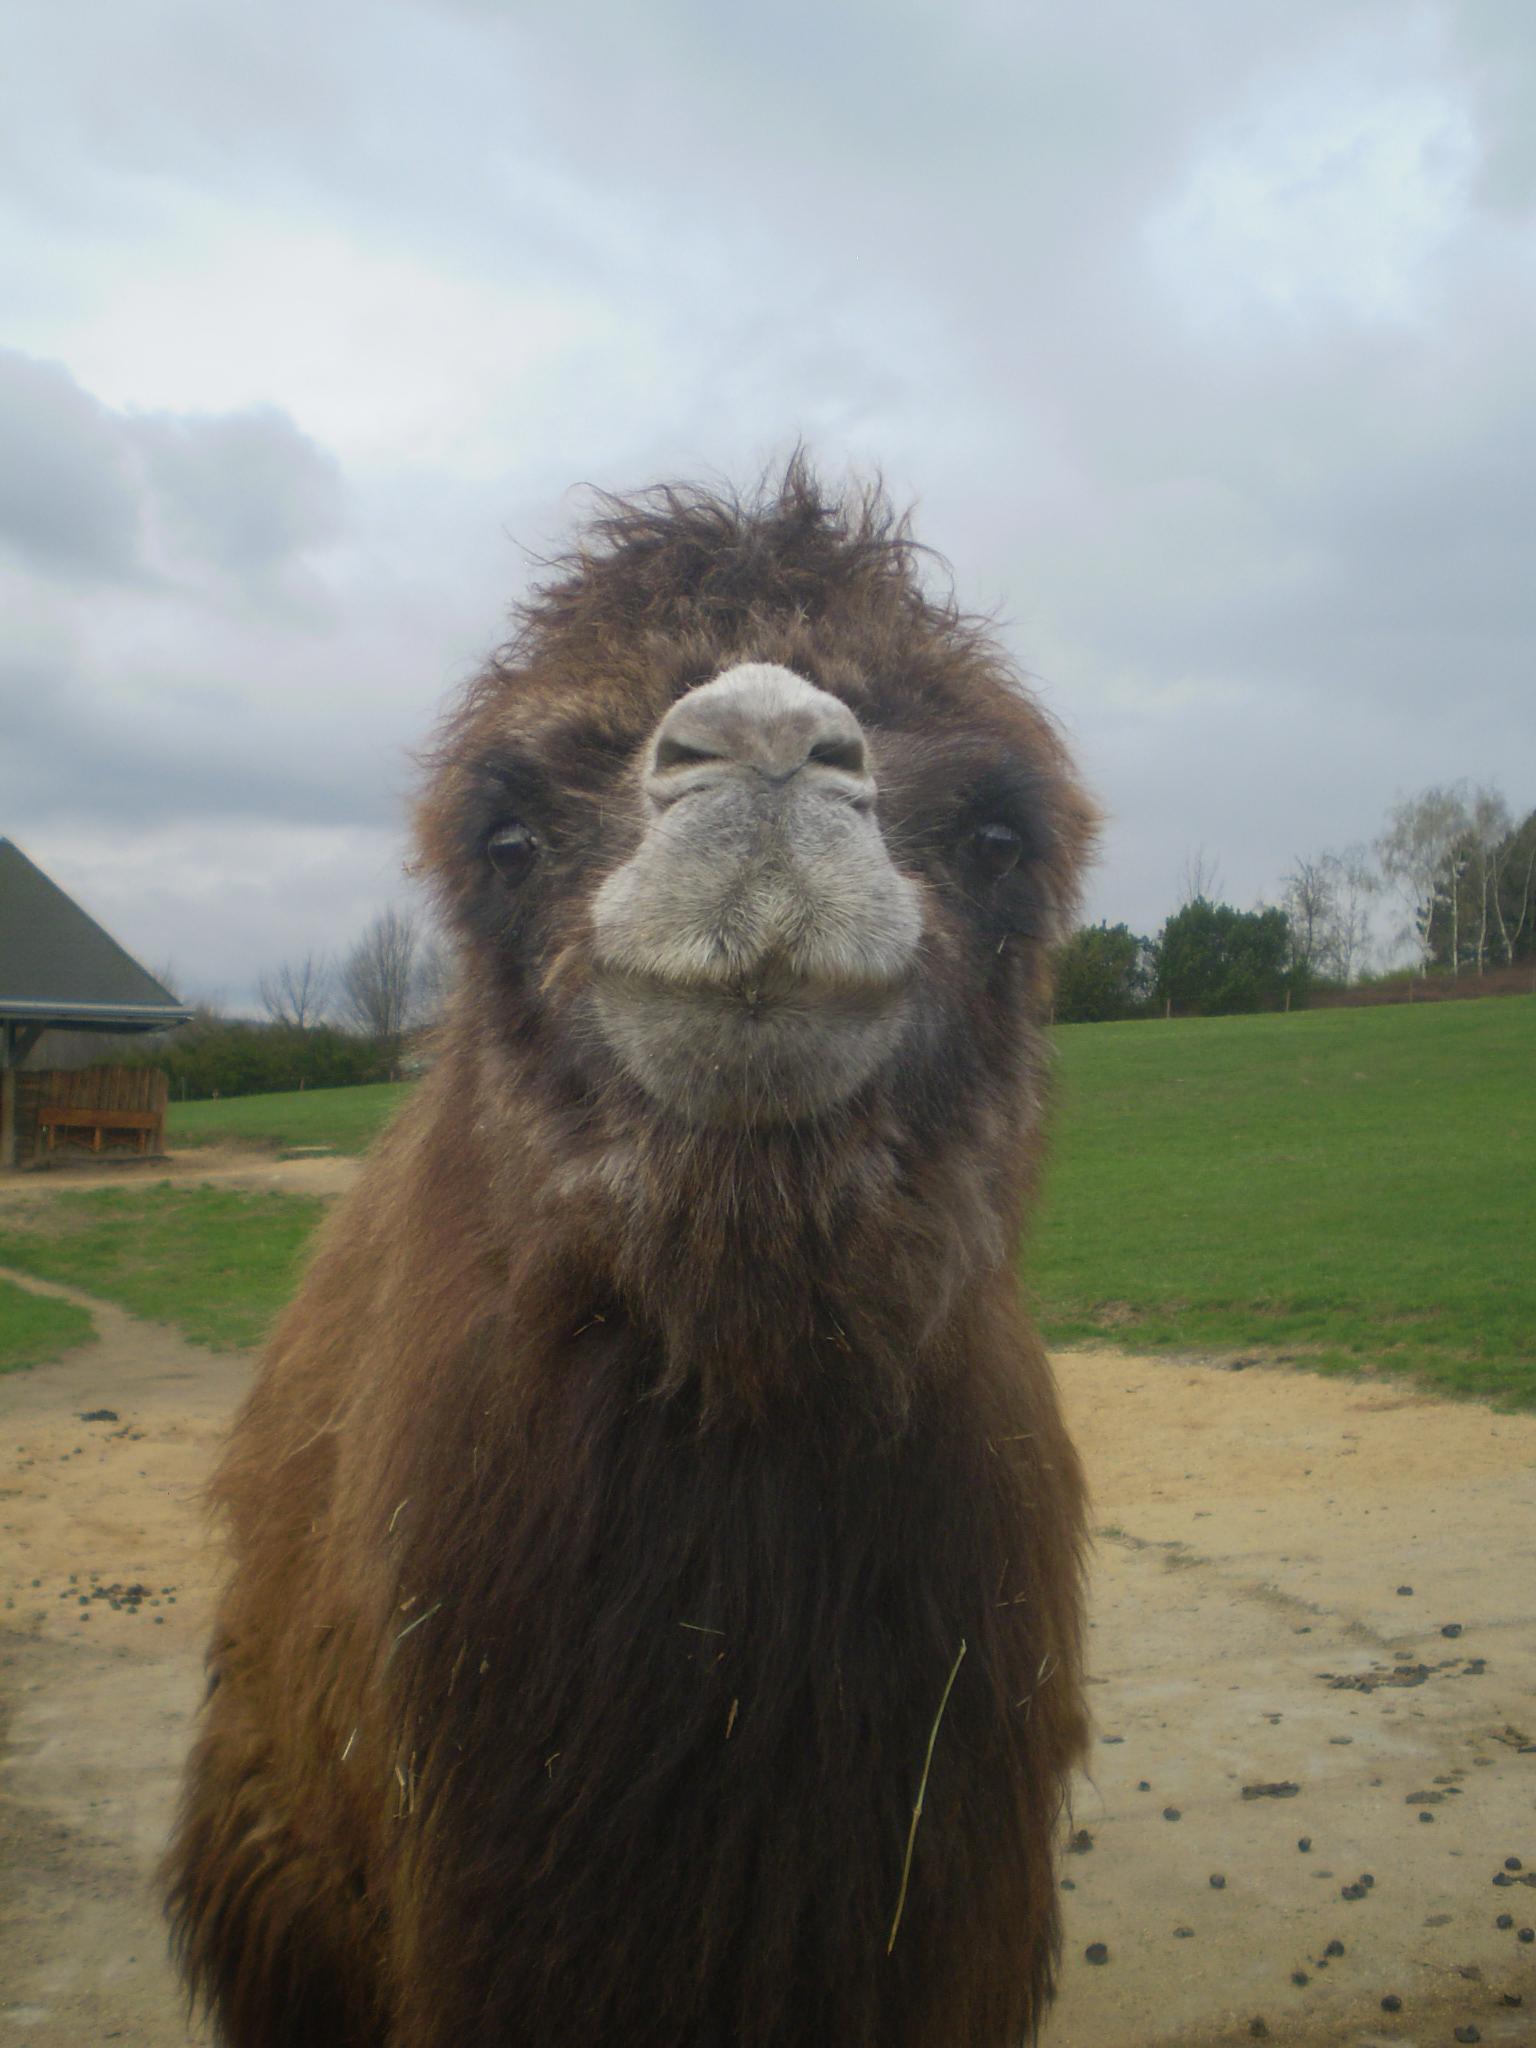 Camel is smiling by Jan Bedřich